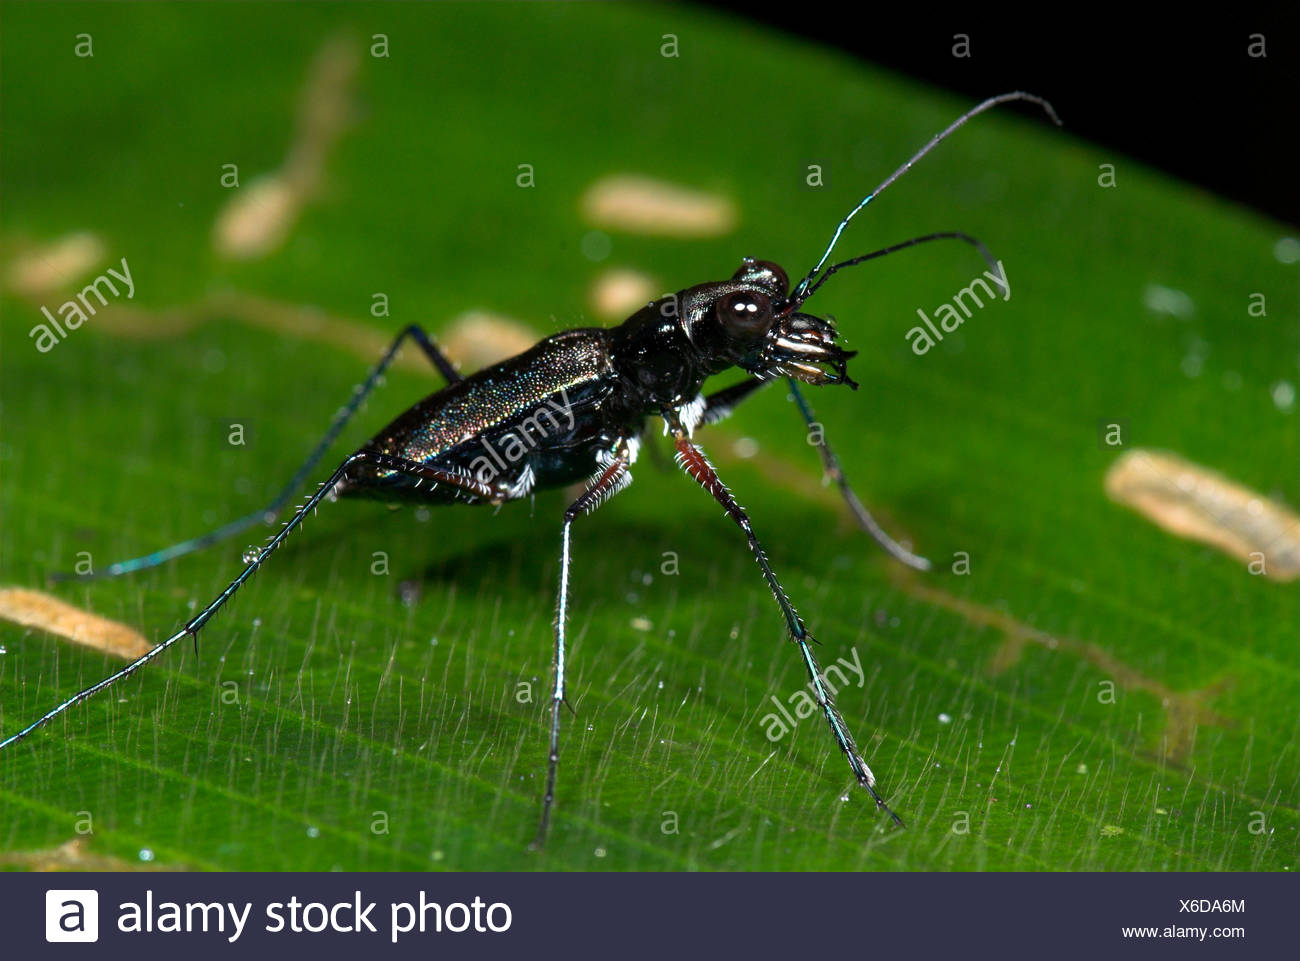 Tiger Beetle Subfamily Cicindelinae Costa Rica Stock Photo